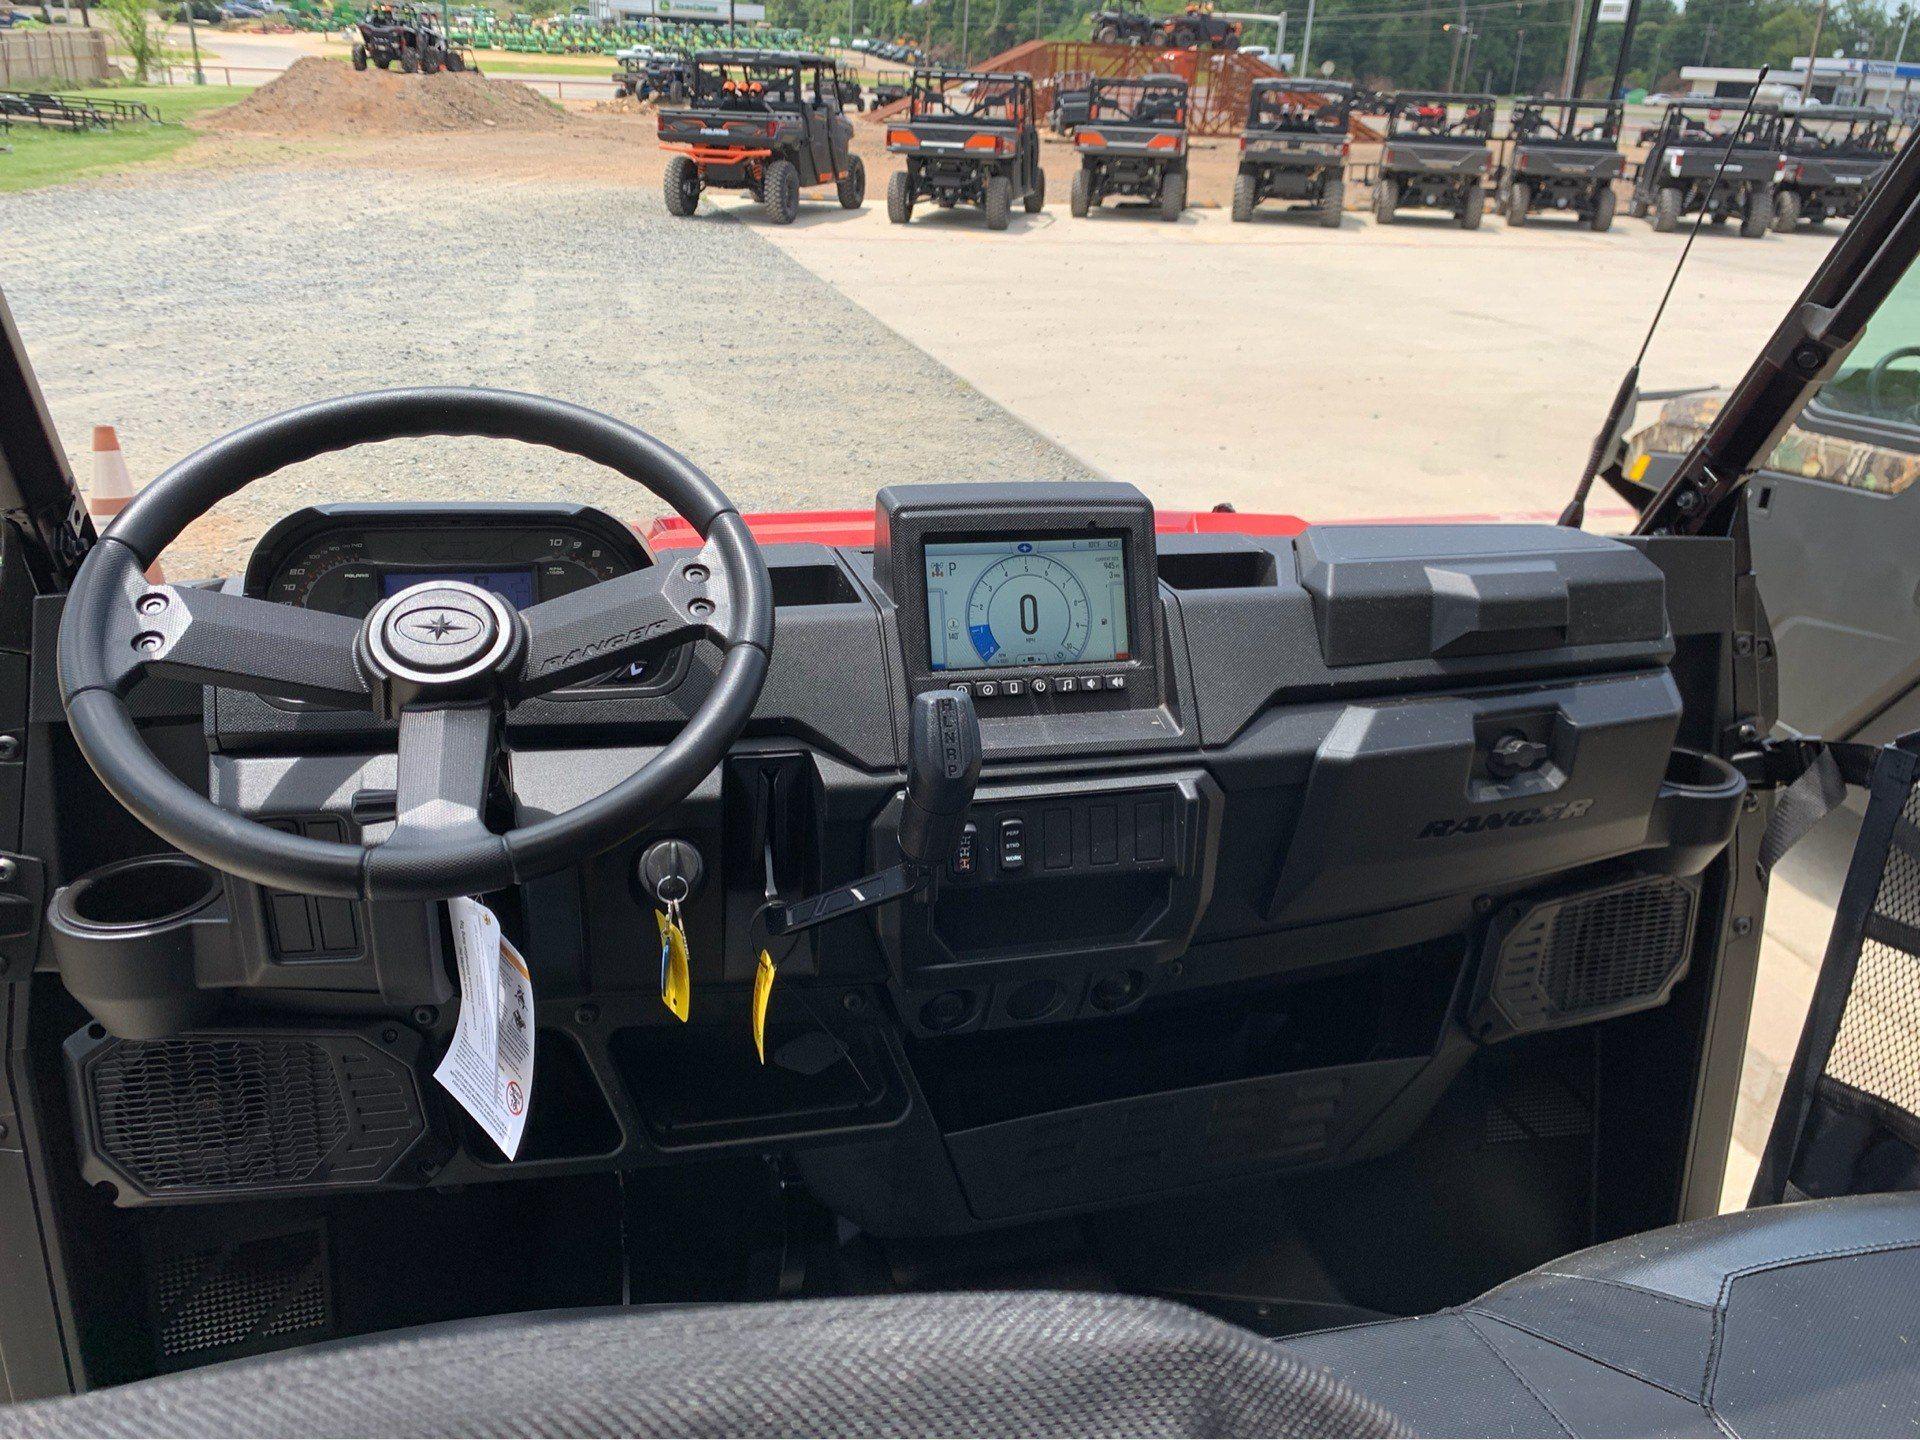 2019 Polaris Ranger Crew XP 1000 EPS Ride Command in Marshall, Texas